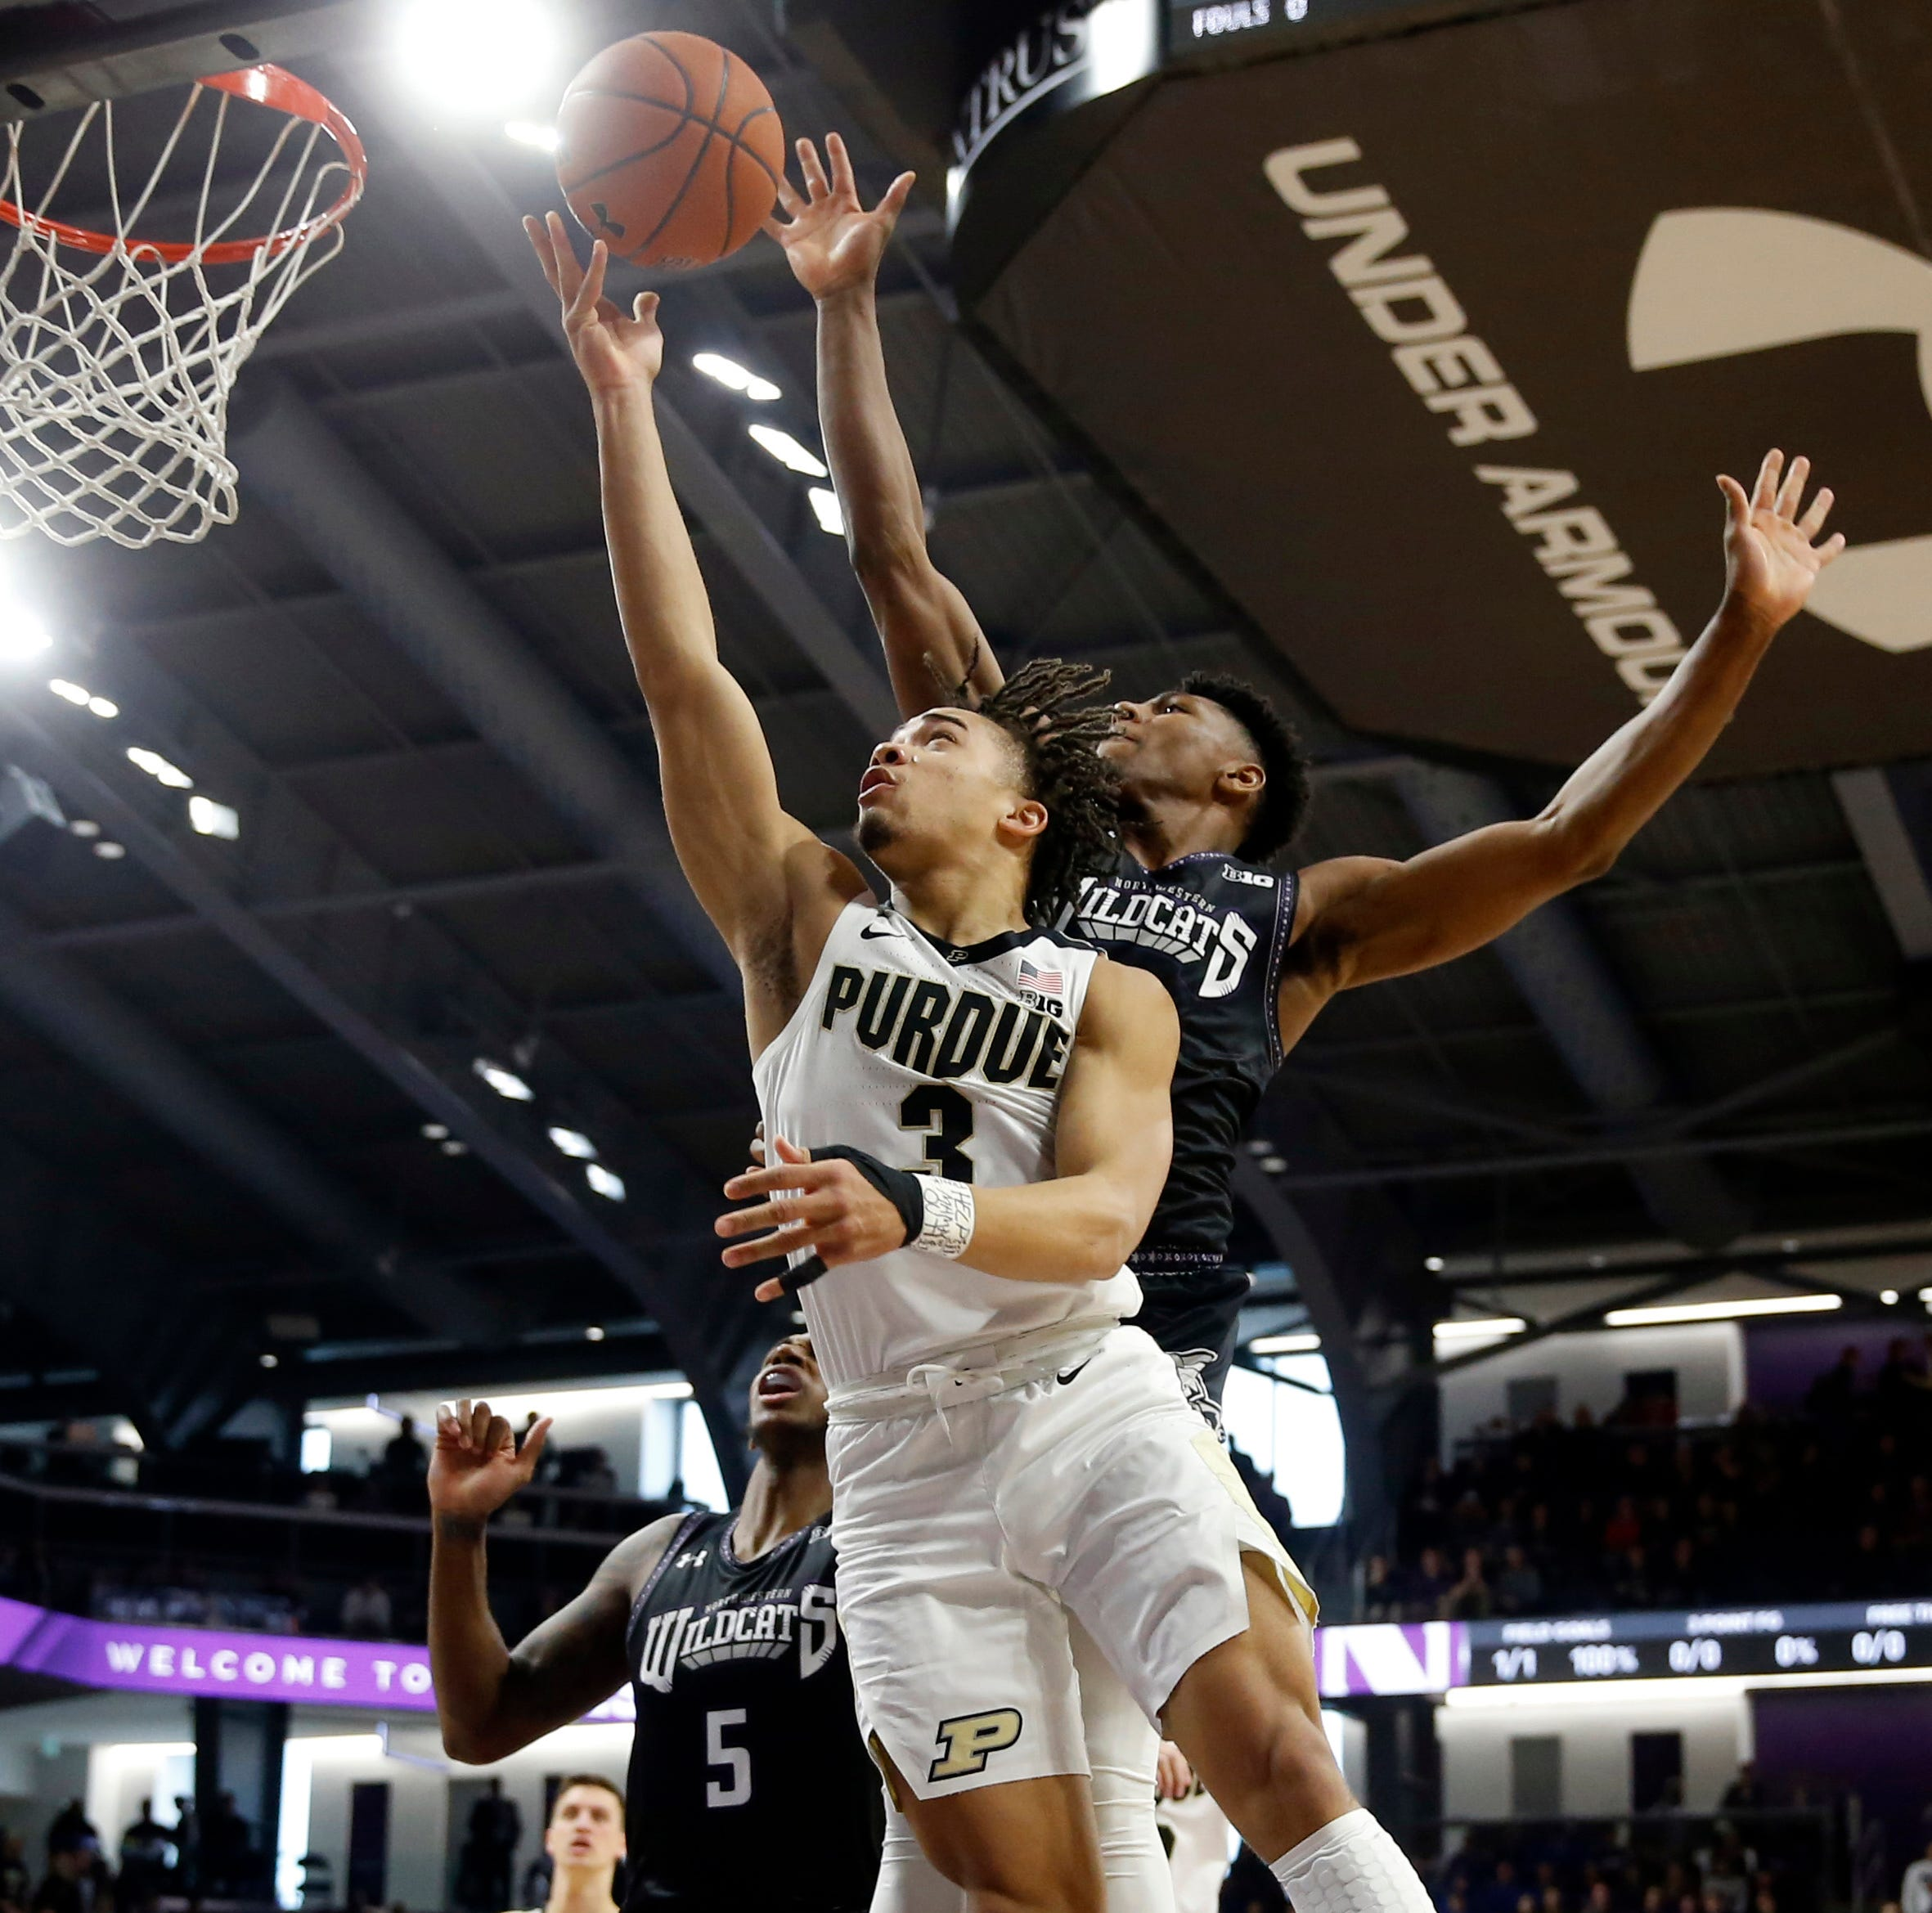 Purdue basketball beats Northwestern to lock up share of Big Ten championship